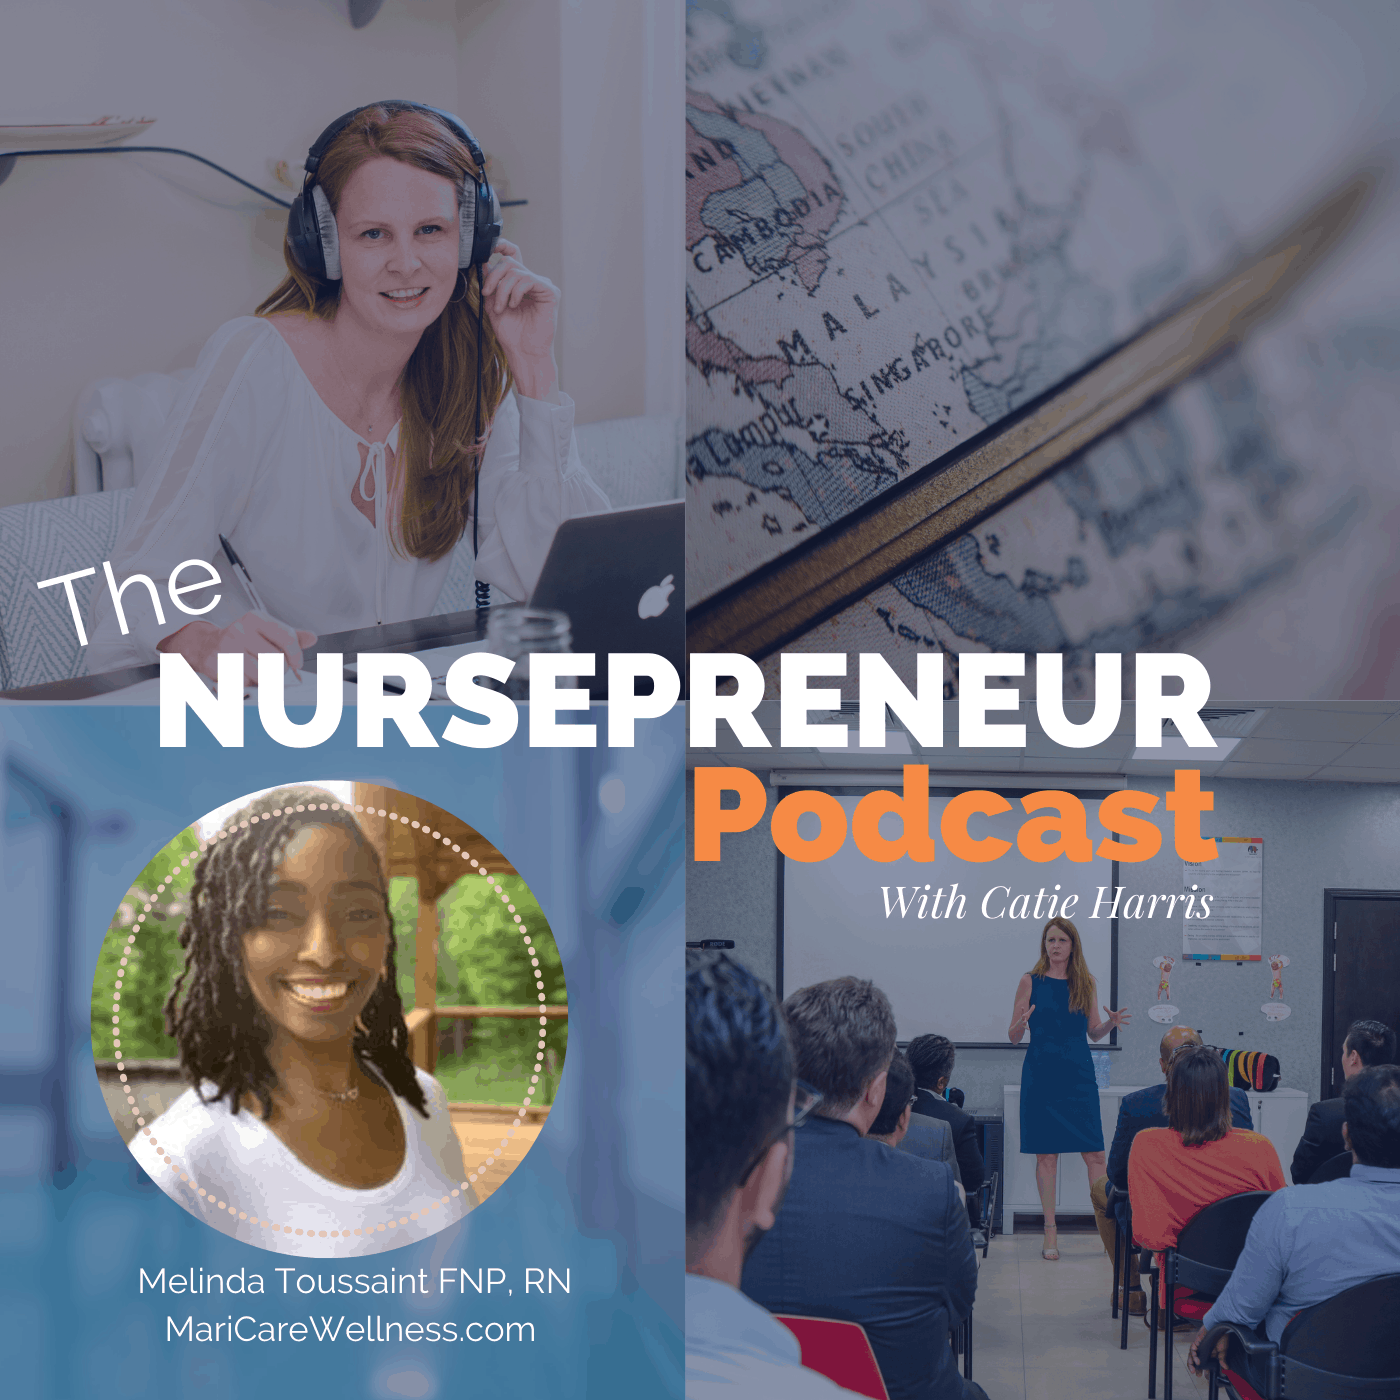 MariCare Wellness NursePreneur Podcast